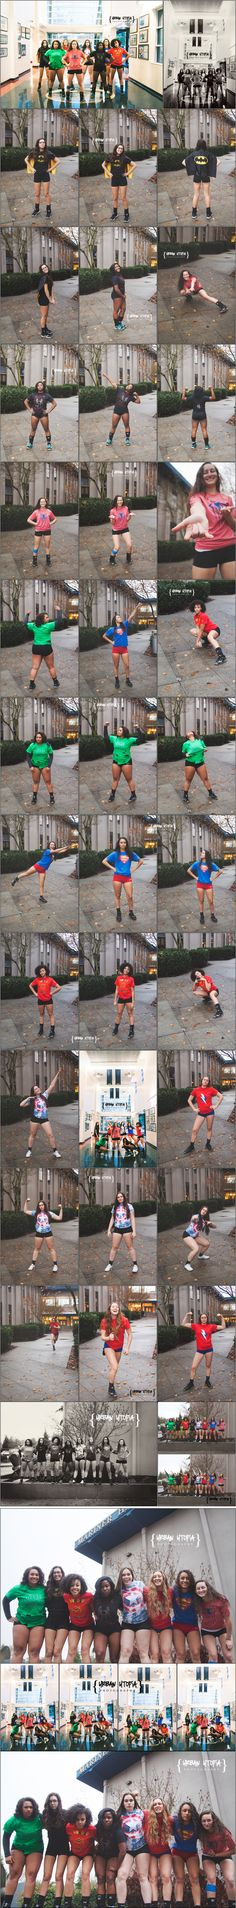 Urban Utopia Photography www.urbanutopiaphotography.com #sanfrancisco #seattle #everett #washington #mukilteo #mukilteosenior #seniorgirl #teamphotography #varsityvolleyball #superherogirls #senior #virginia #virginiabeach #charleston #tampa #sandiego